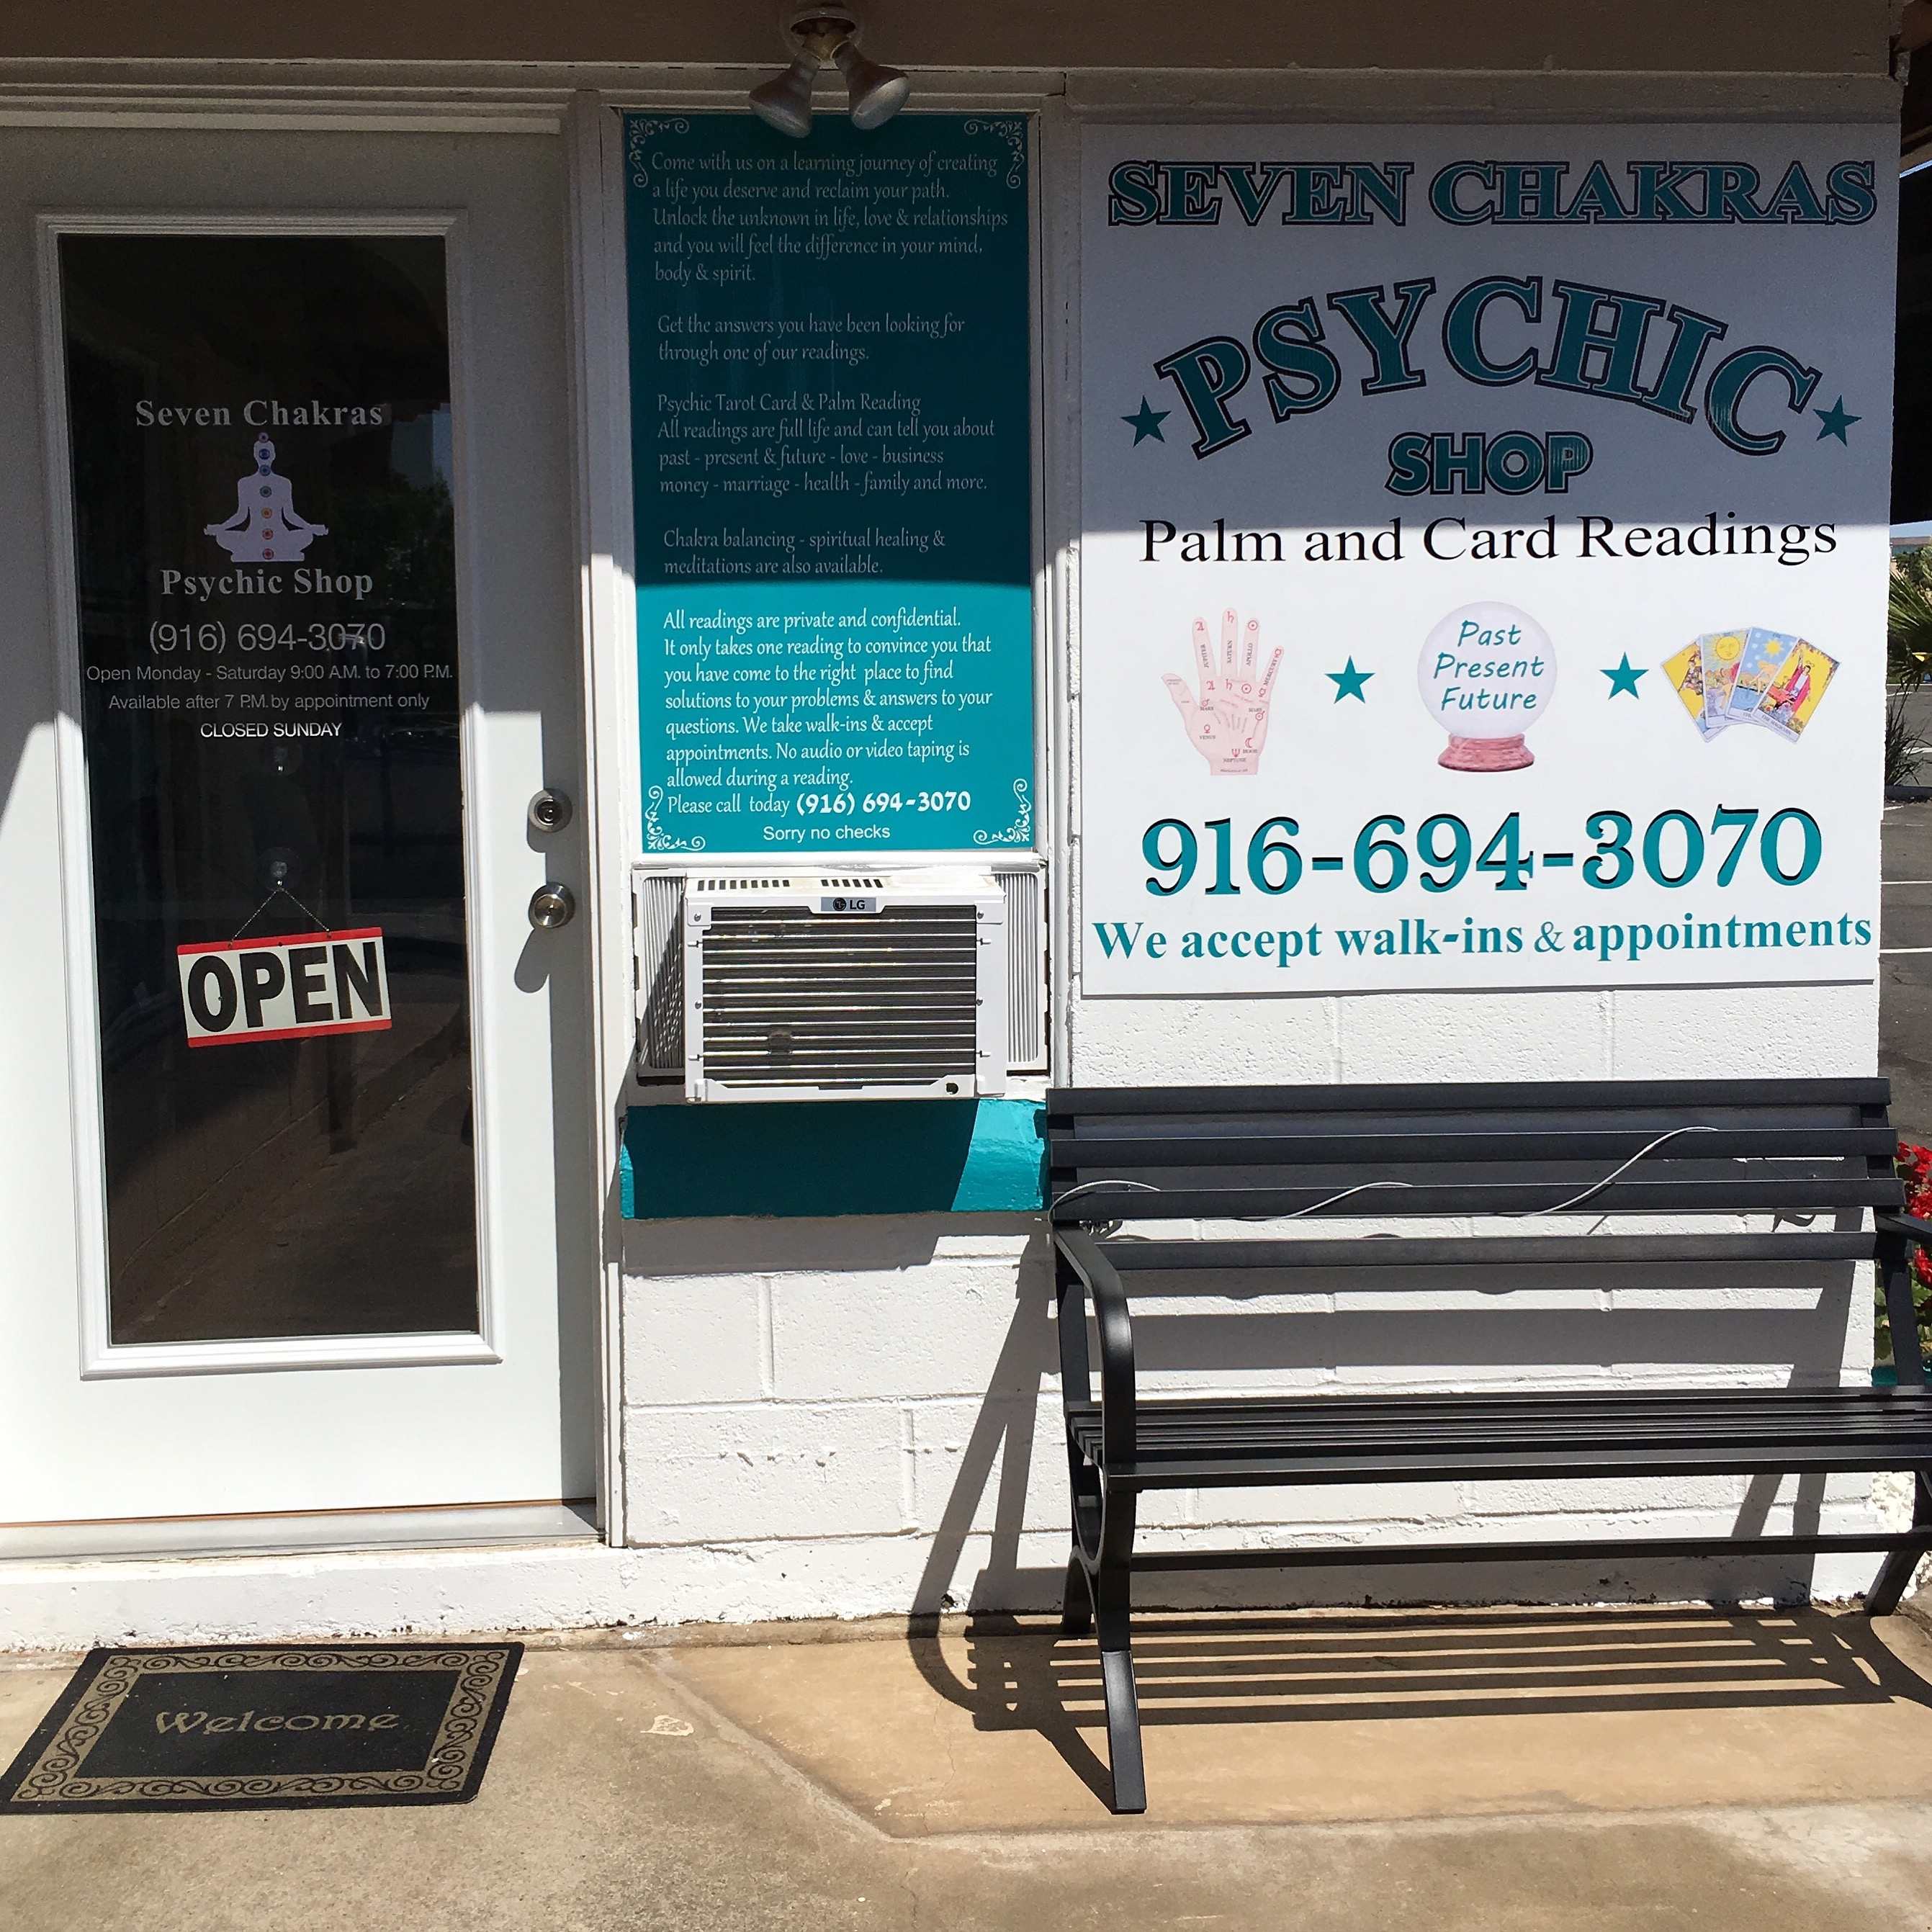 Seven chakras psychic shop image 1